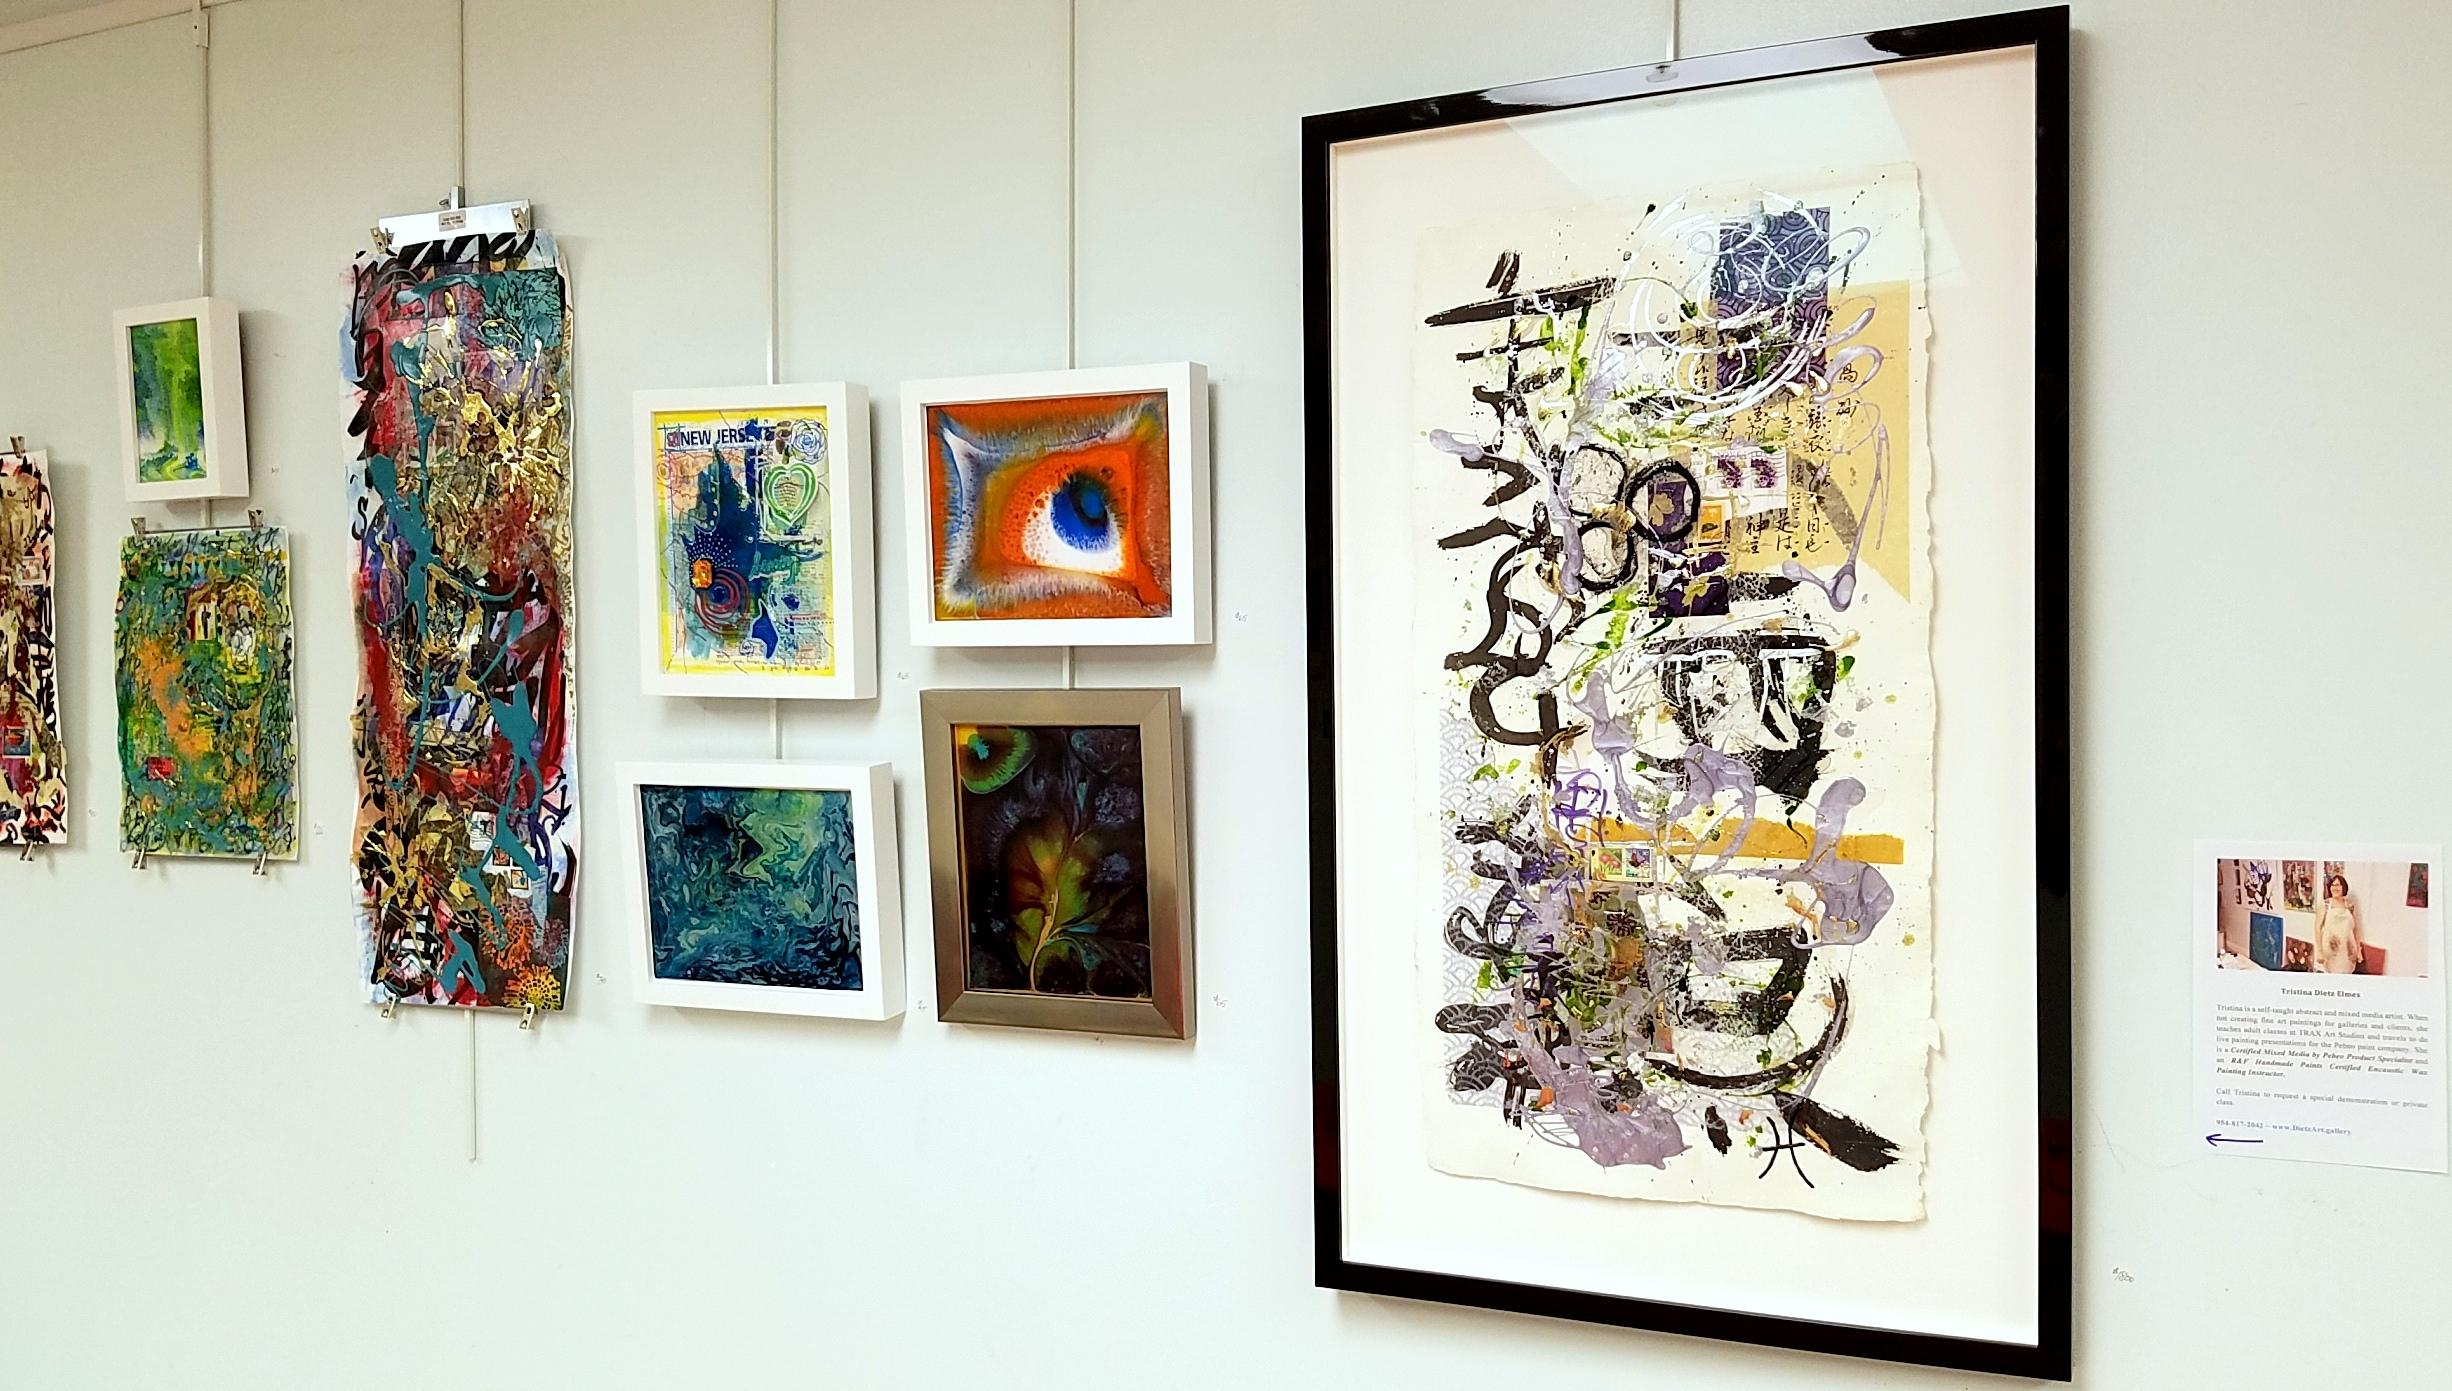 Sneak Peek of my newest artworks at TRAX Art Studios.